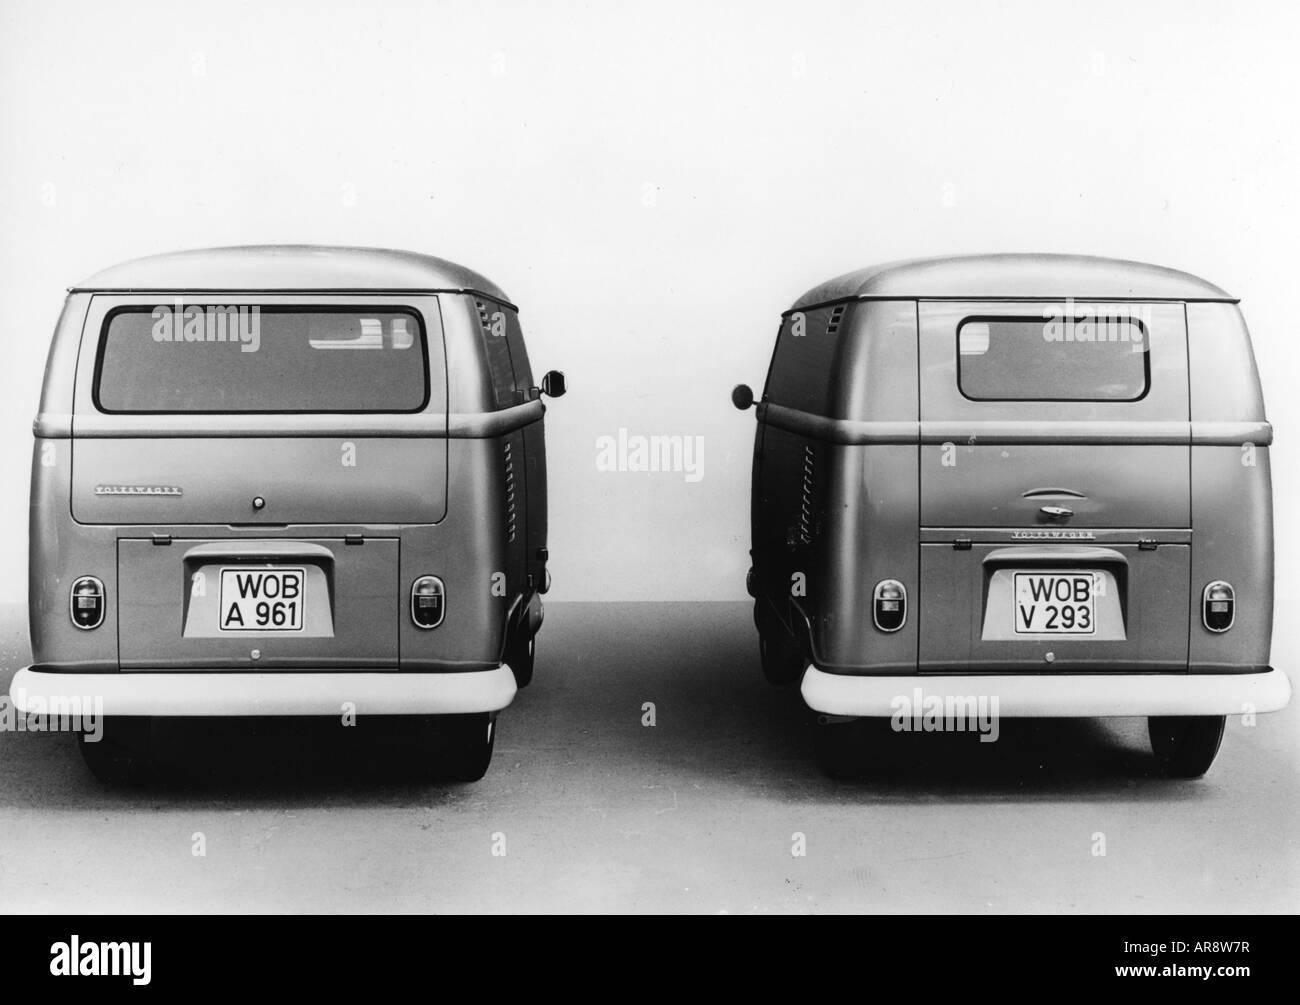 Transport Transportation Car Vehicle Variants Volkswagen Vw Stock Photo Alamy